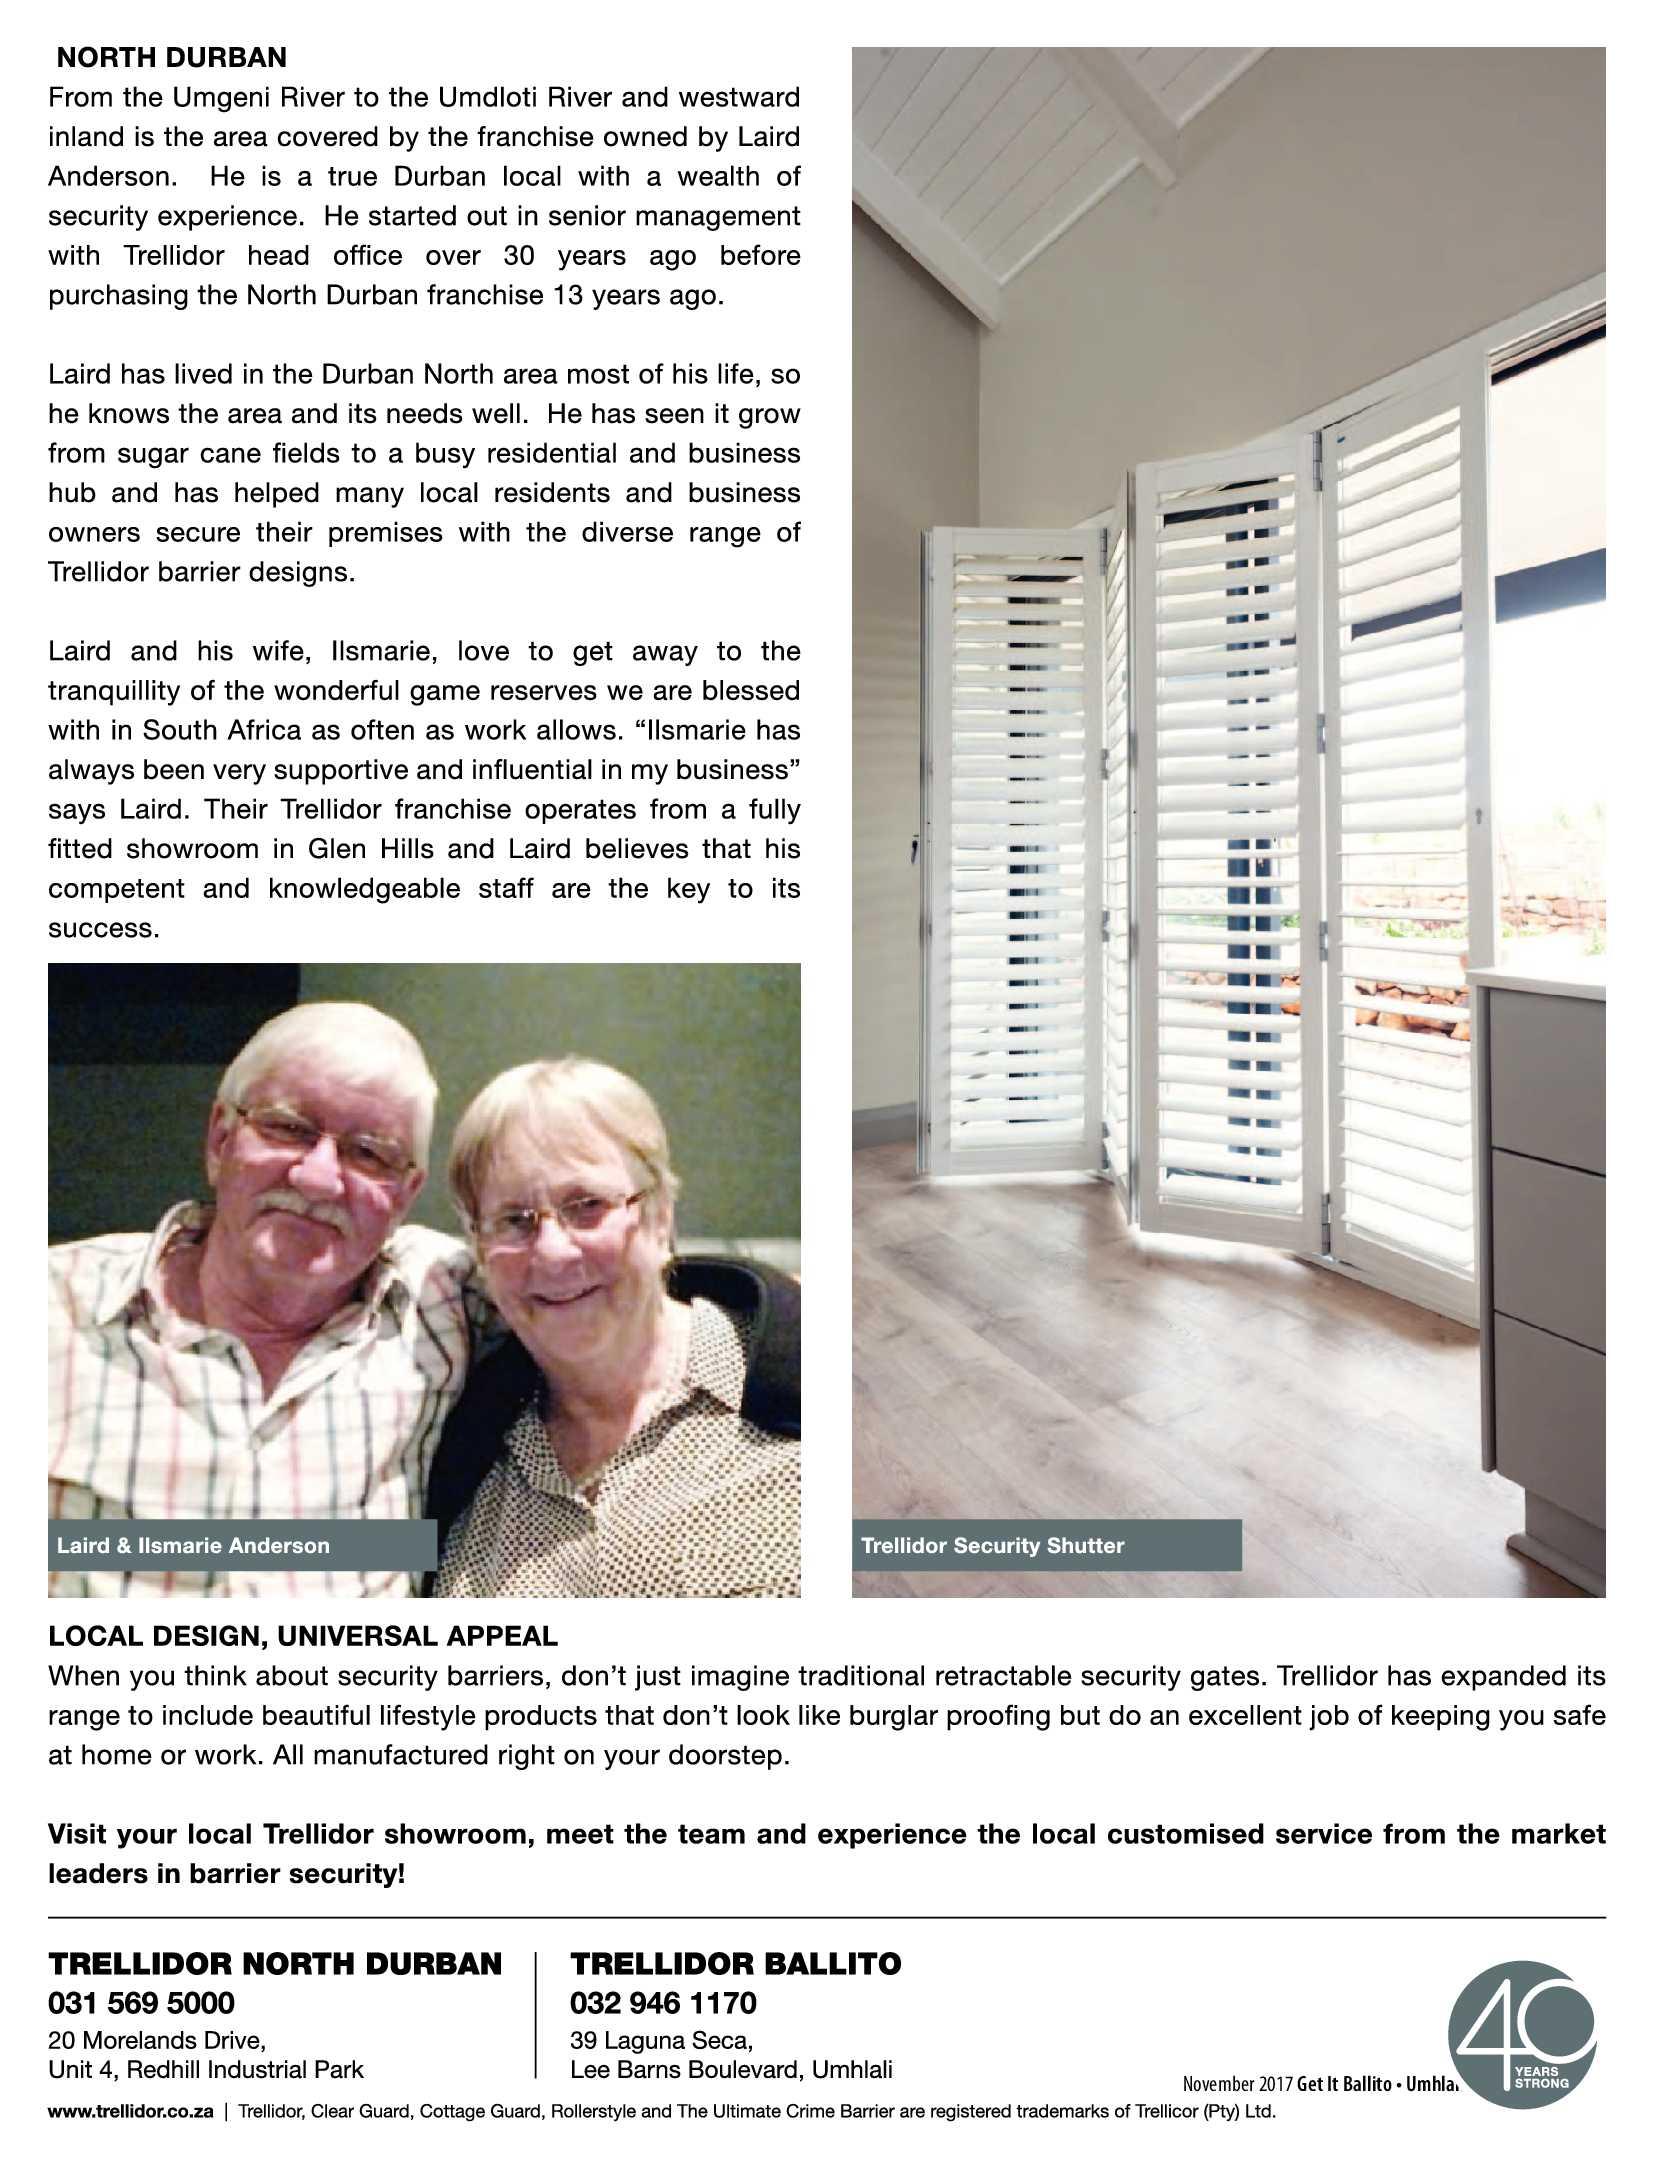 get-magazine-ballitoumhlanga-november-2017-2-epapers-page-55